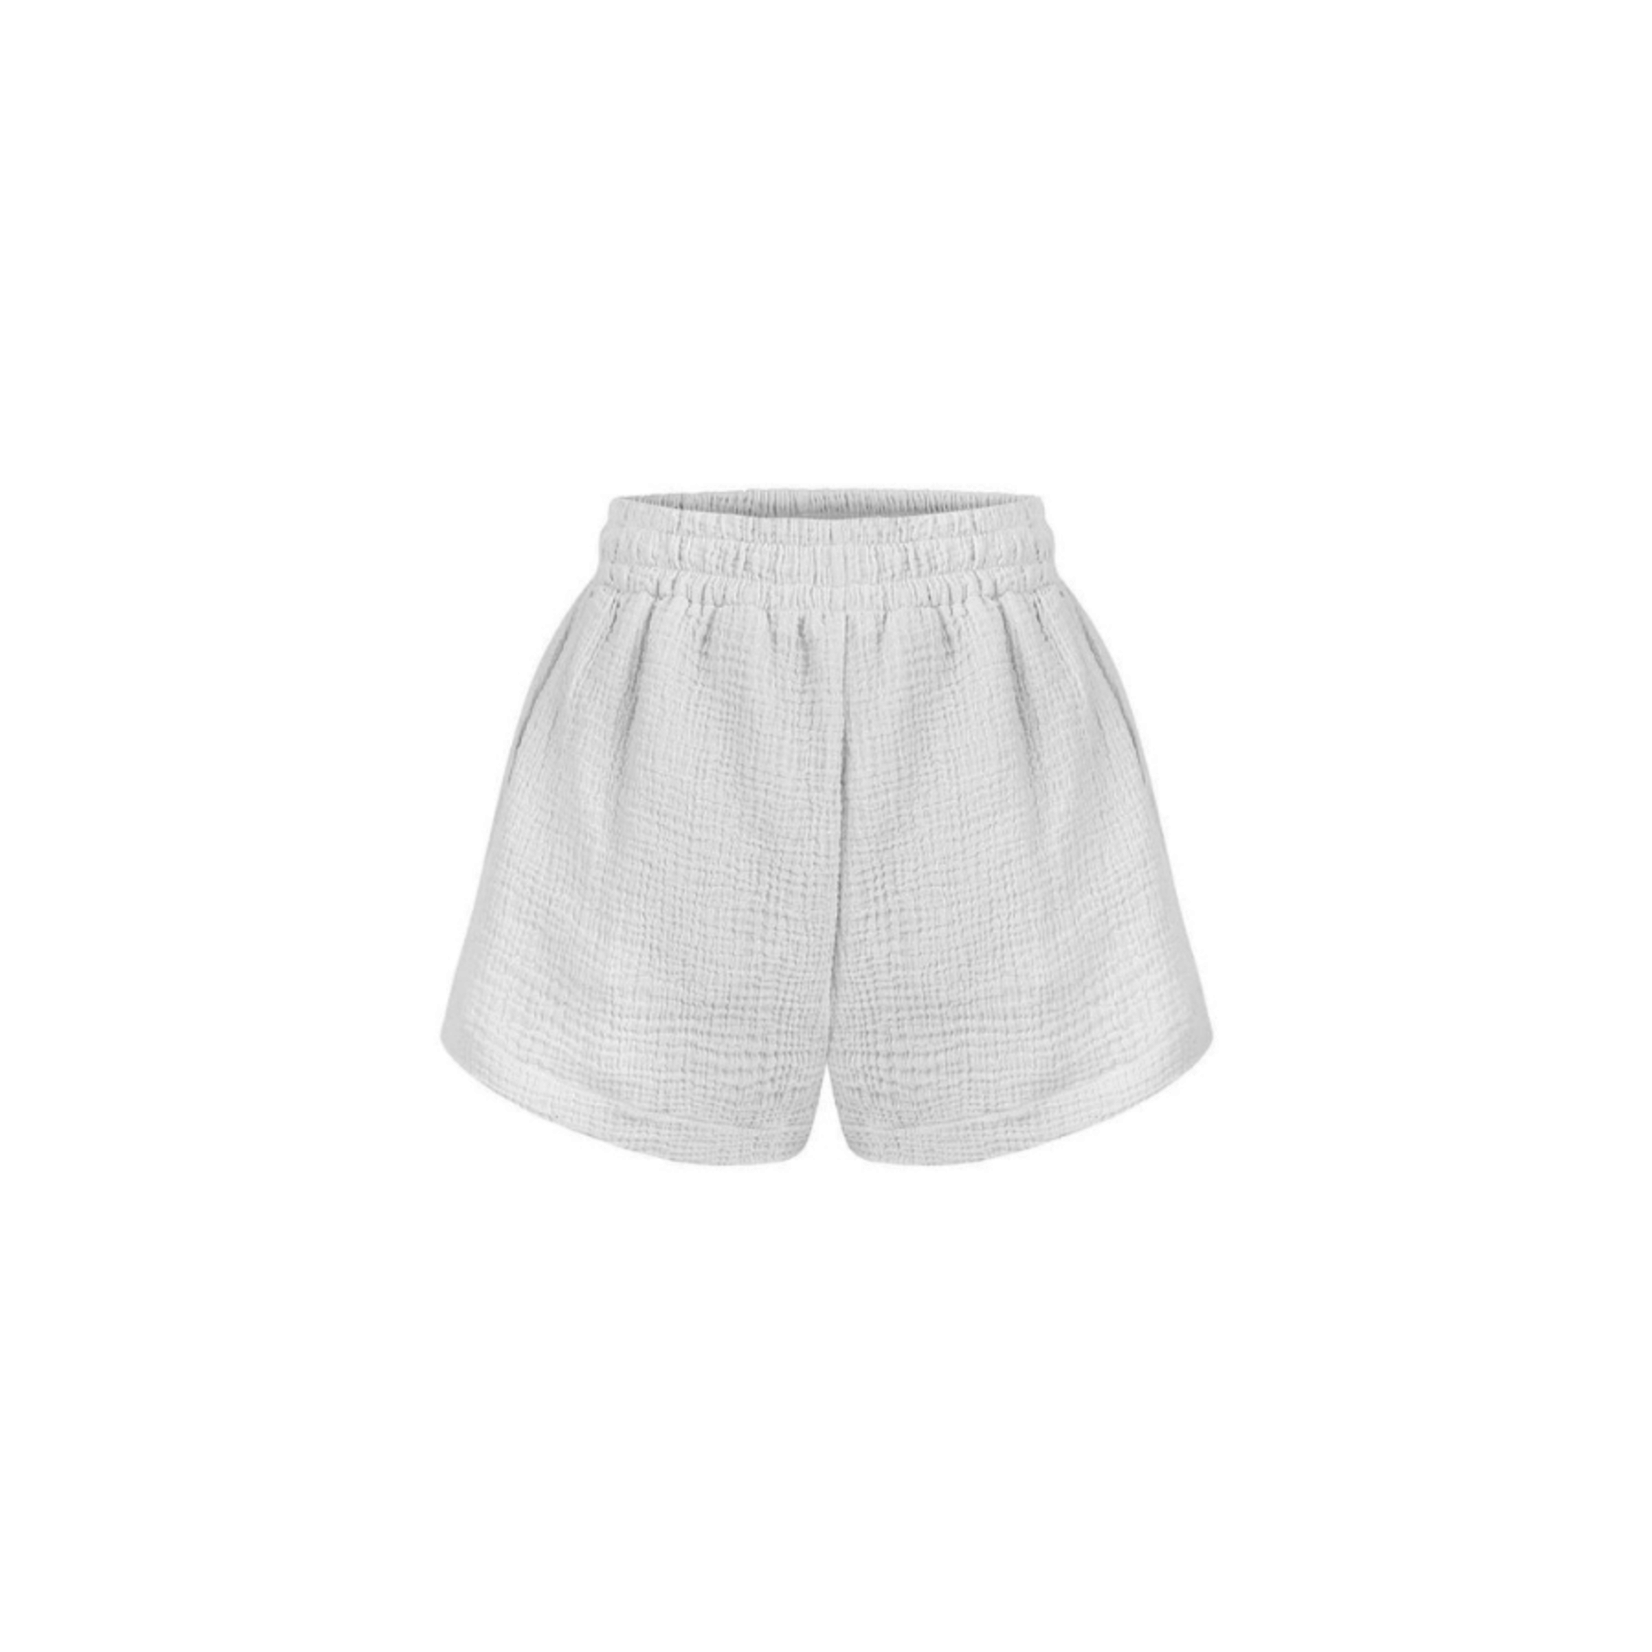 Handloom Echo Boy Short